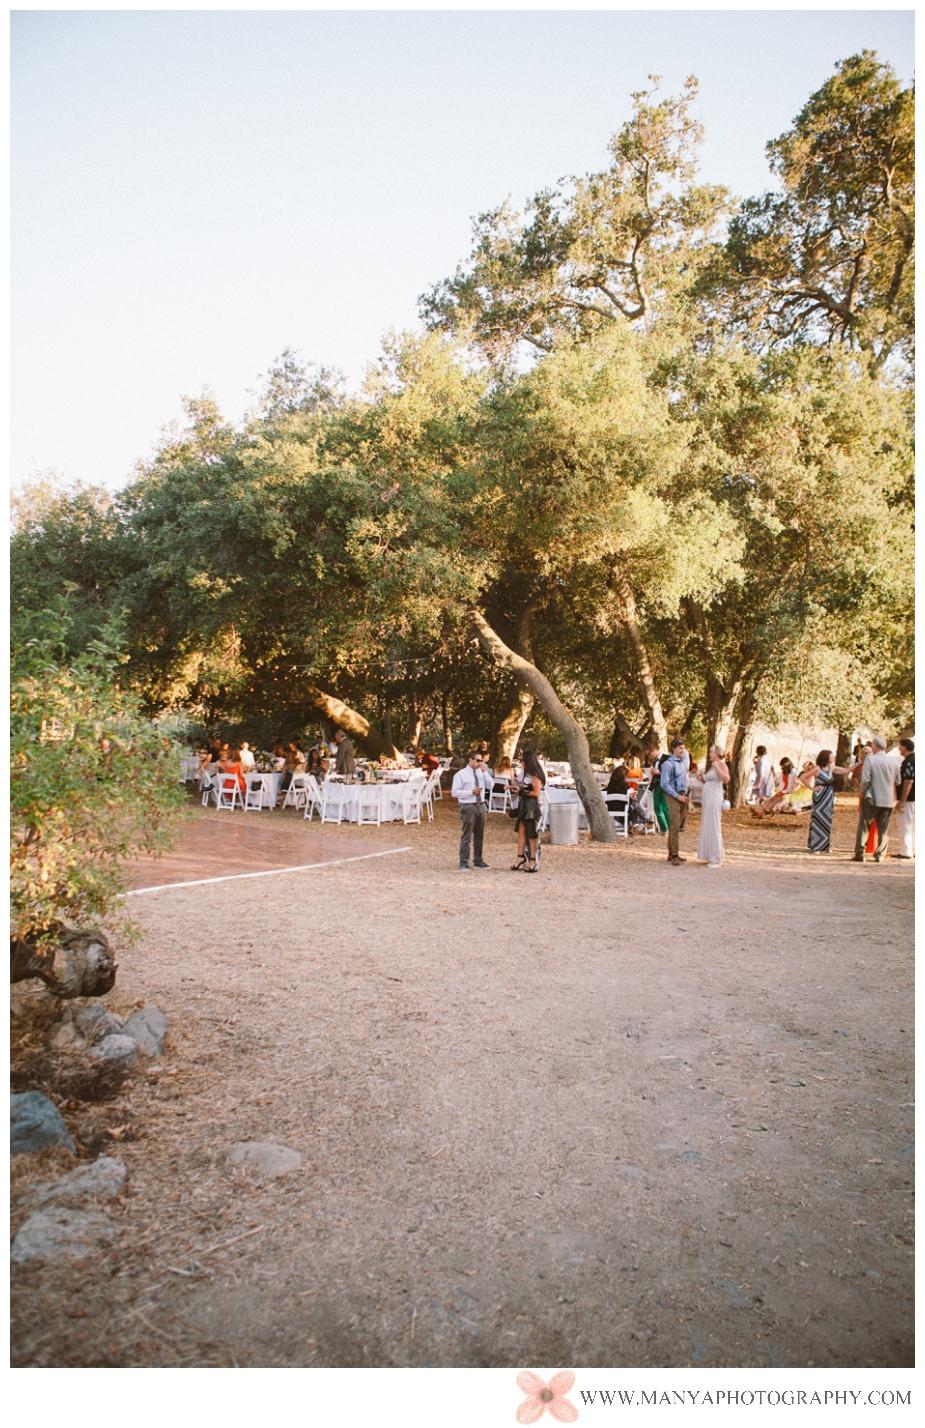 2013-08-15_0121 - Orange County Wedding Photographer